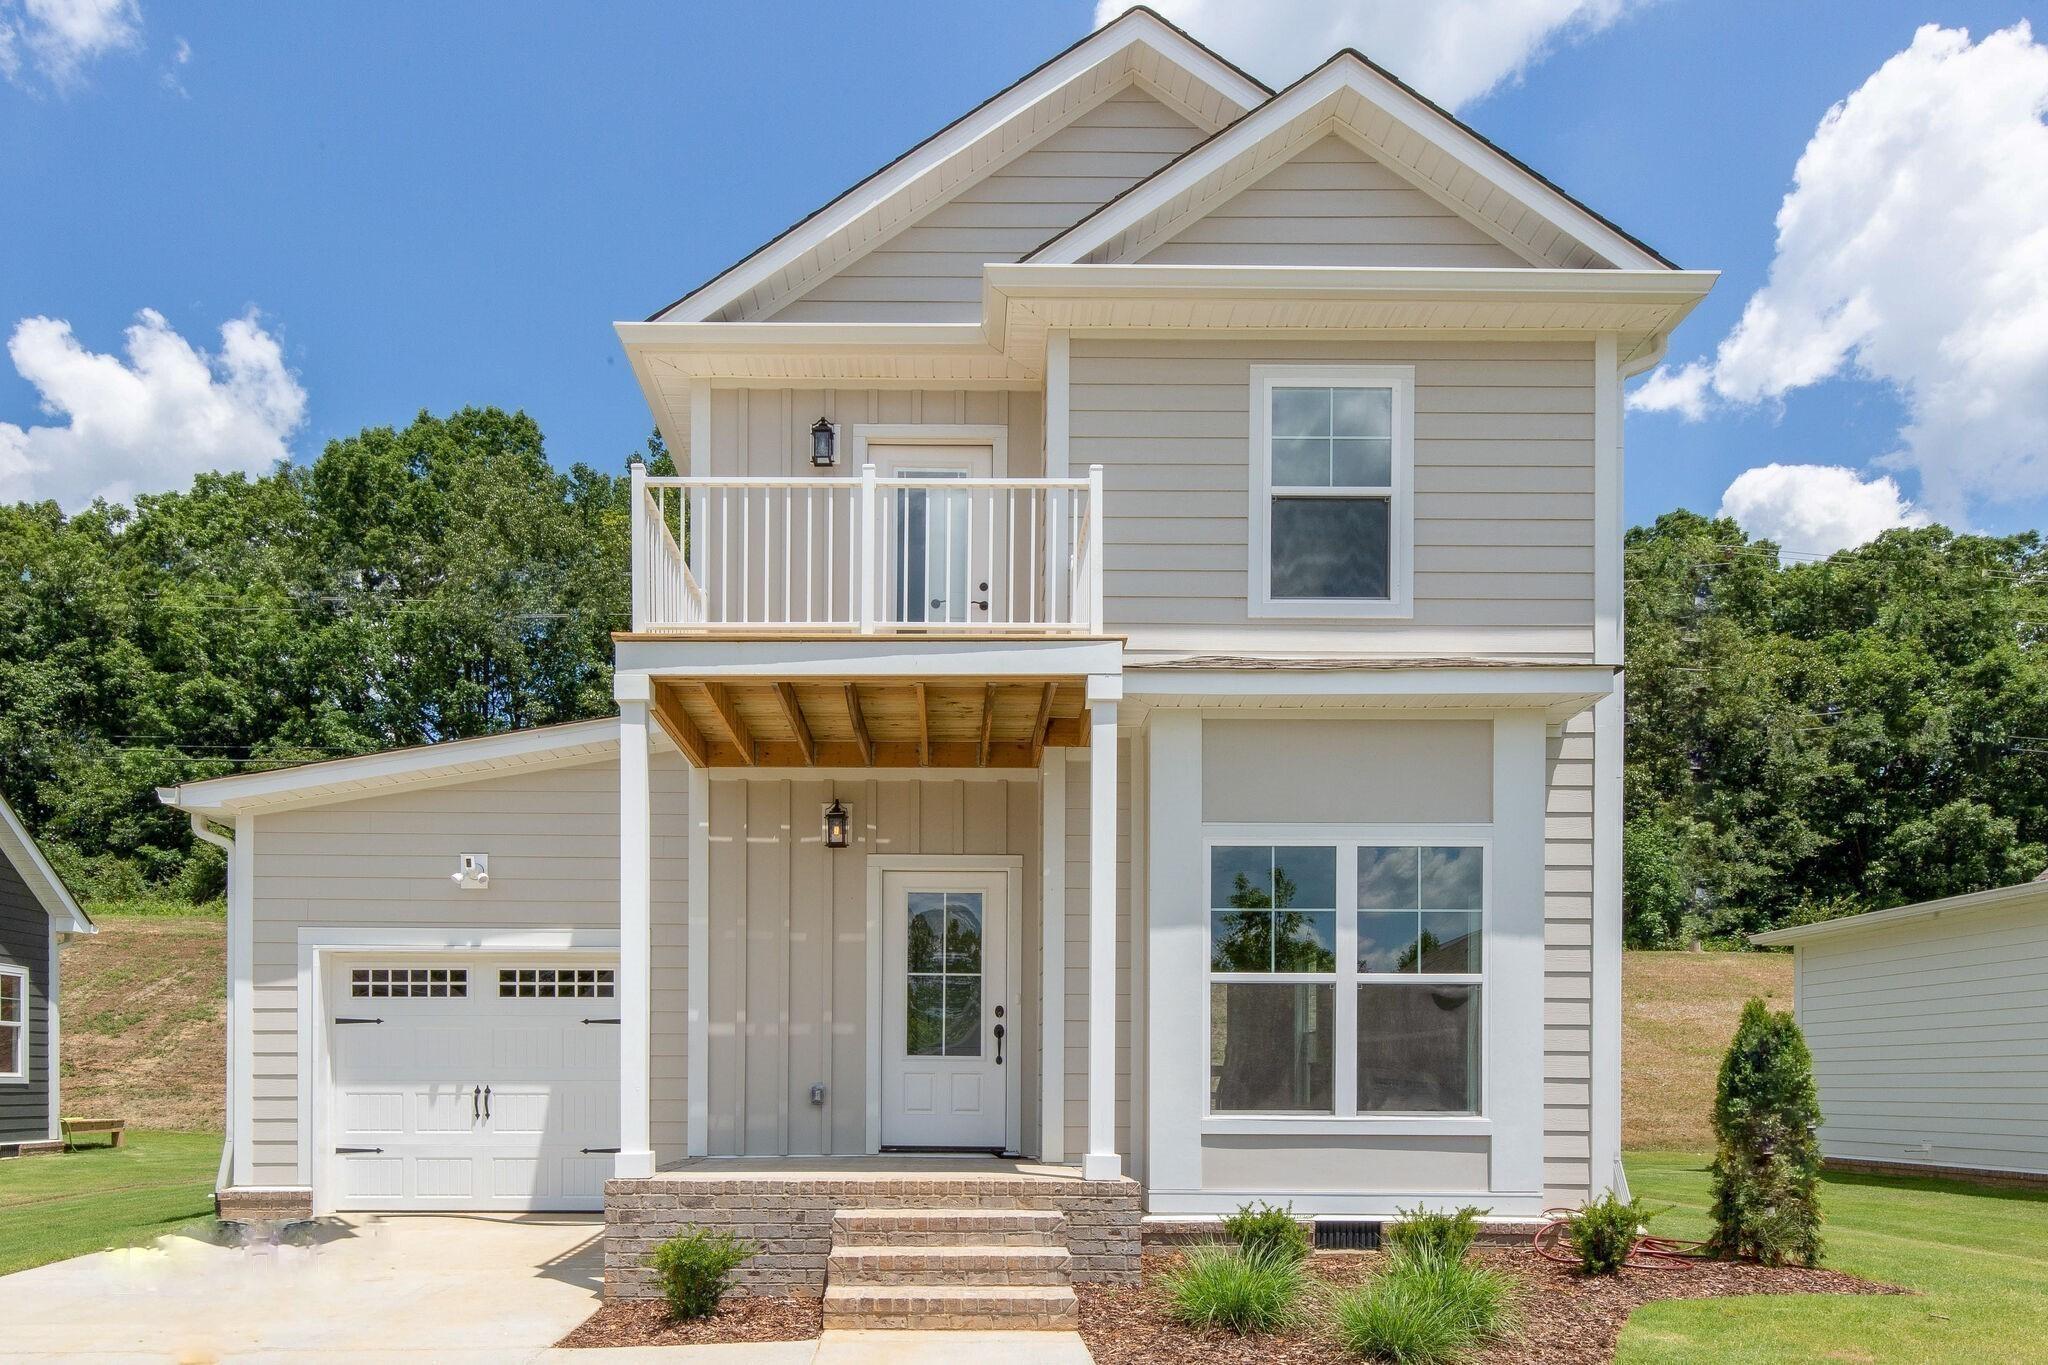 31 Sycamore Ridge East Property Photo - Burns, TN real estate listing